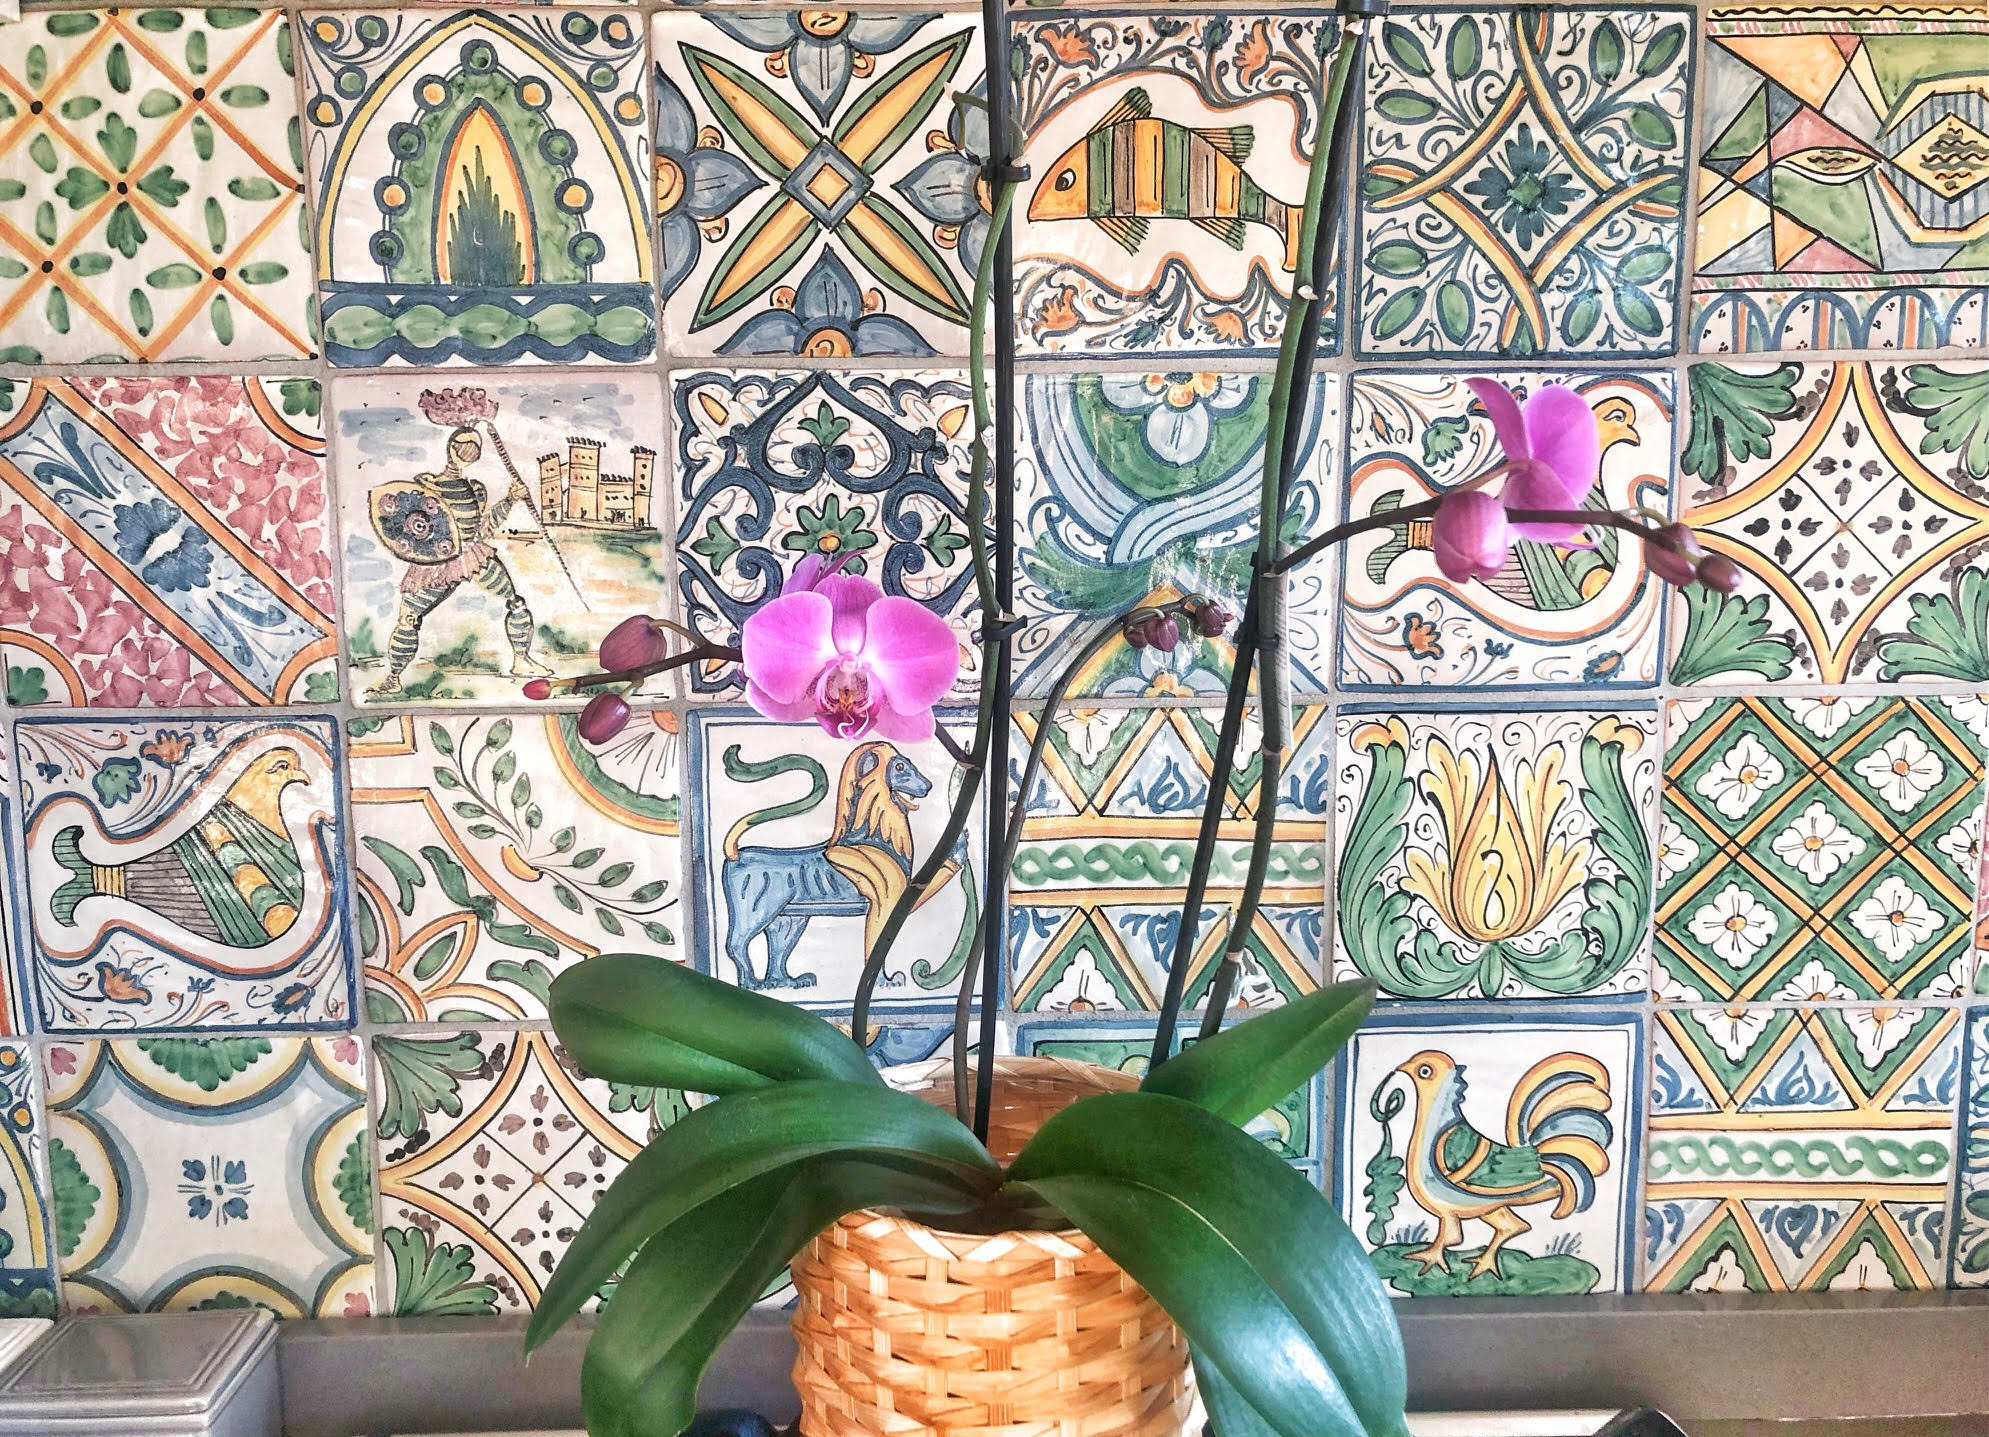 La mia orchidea, specie Phalaenopsis. © oltreilbalcone